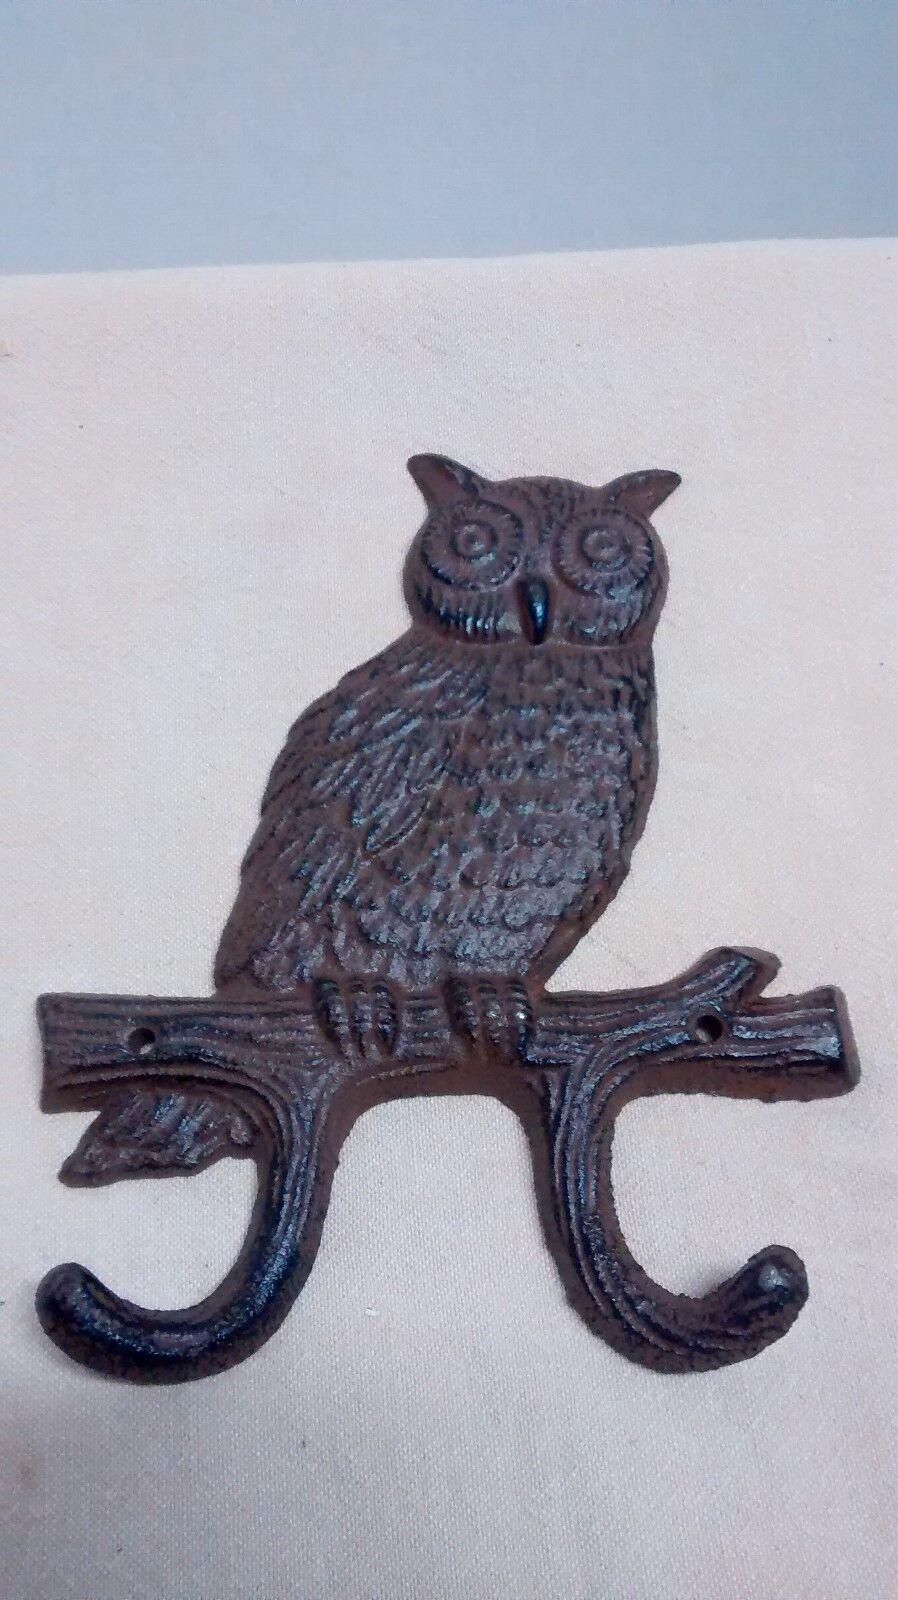 Cast Iron Hoot Owl towel hanger coat hooks hat hook key rack home garden decor